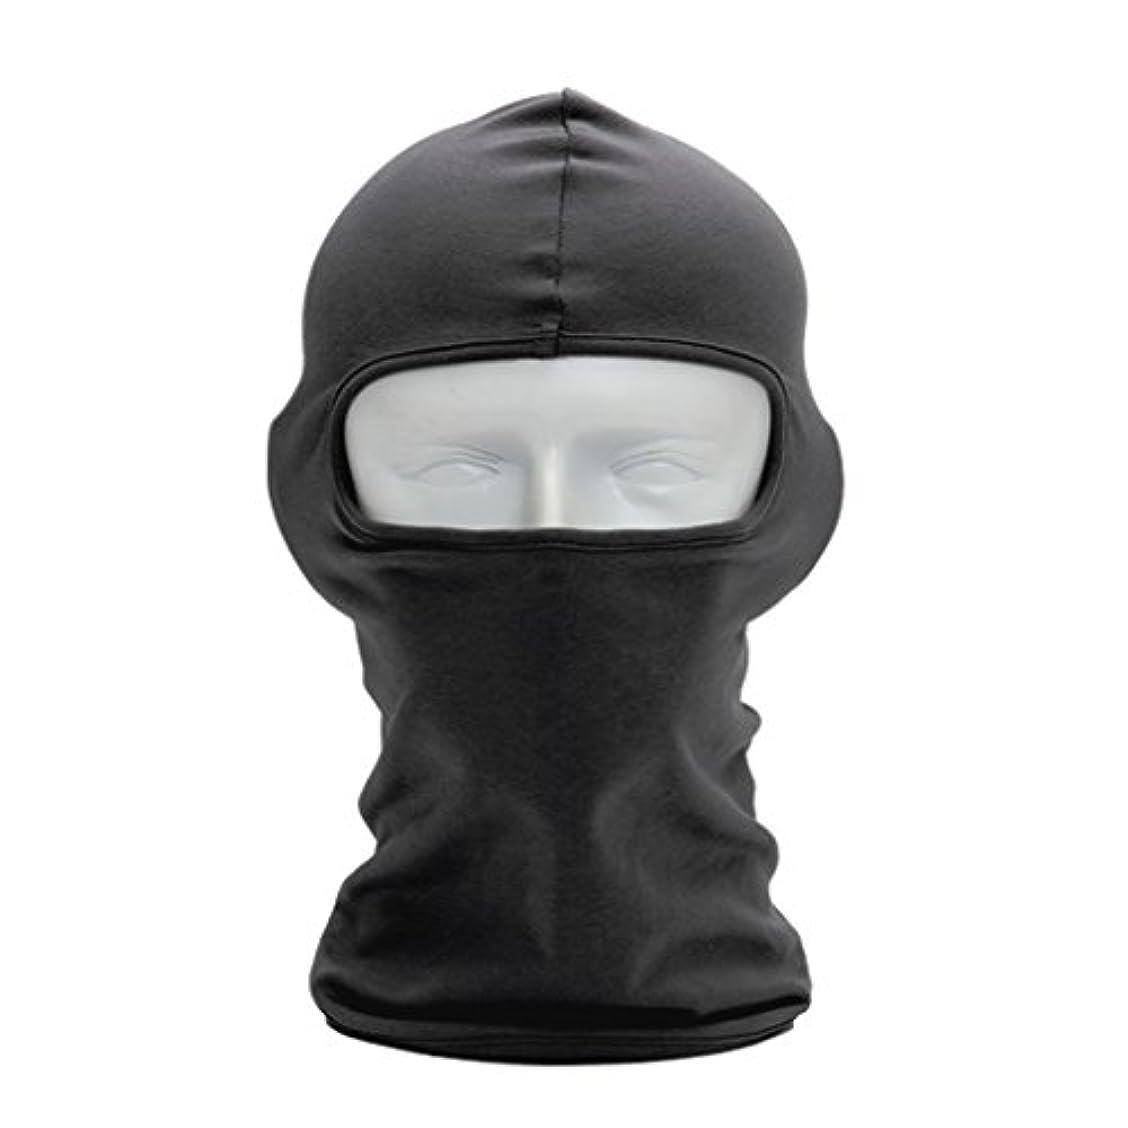 Greenery アウトドア防塵/防風マスク 帽子マスク フェイスマスク 紫外線 日焼け 対策 吸汗 速乾 自転車/バイク/スキー/釣り/登山/屋外コンバットなどアウトドアスポーツに利用!